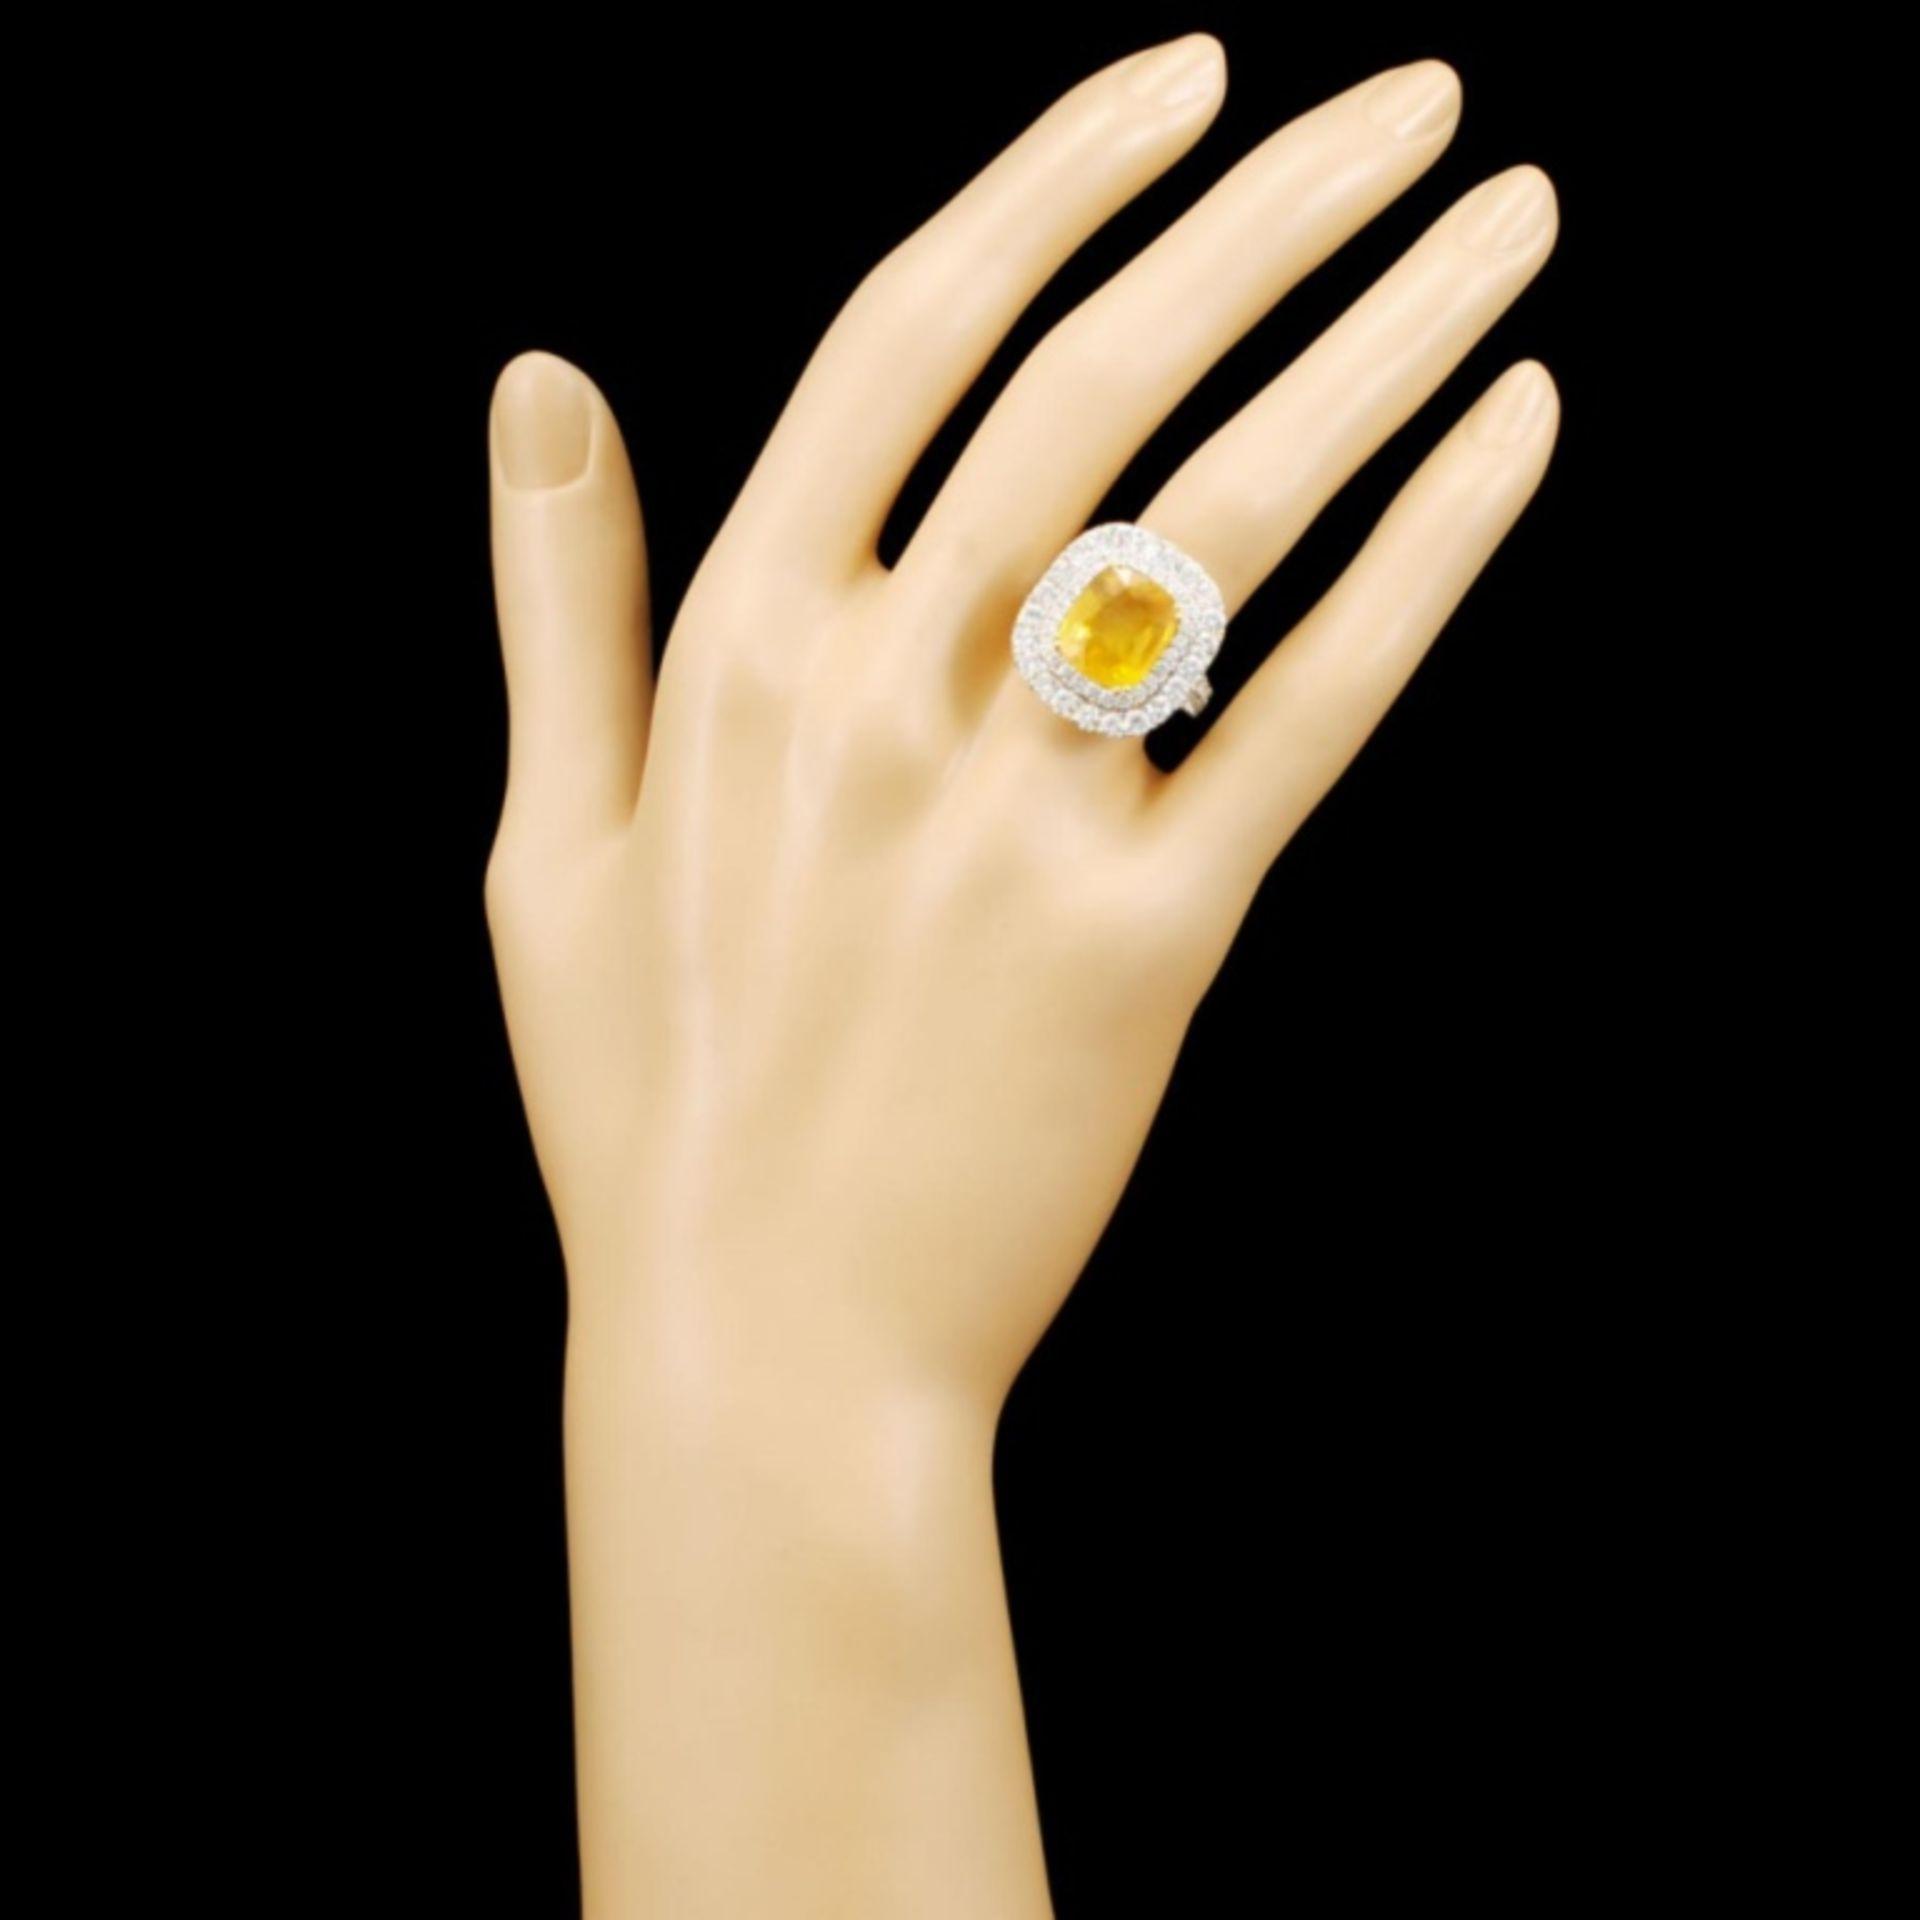 18K Gold 7.66ct Sapphire & 2.99ctw Diamond Ring - Image 4 of 5